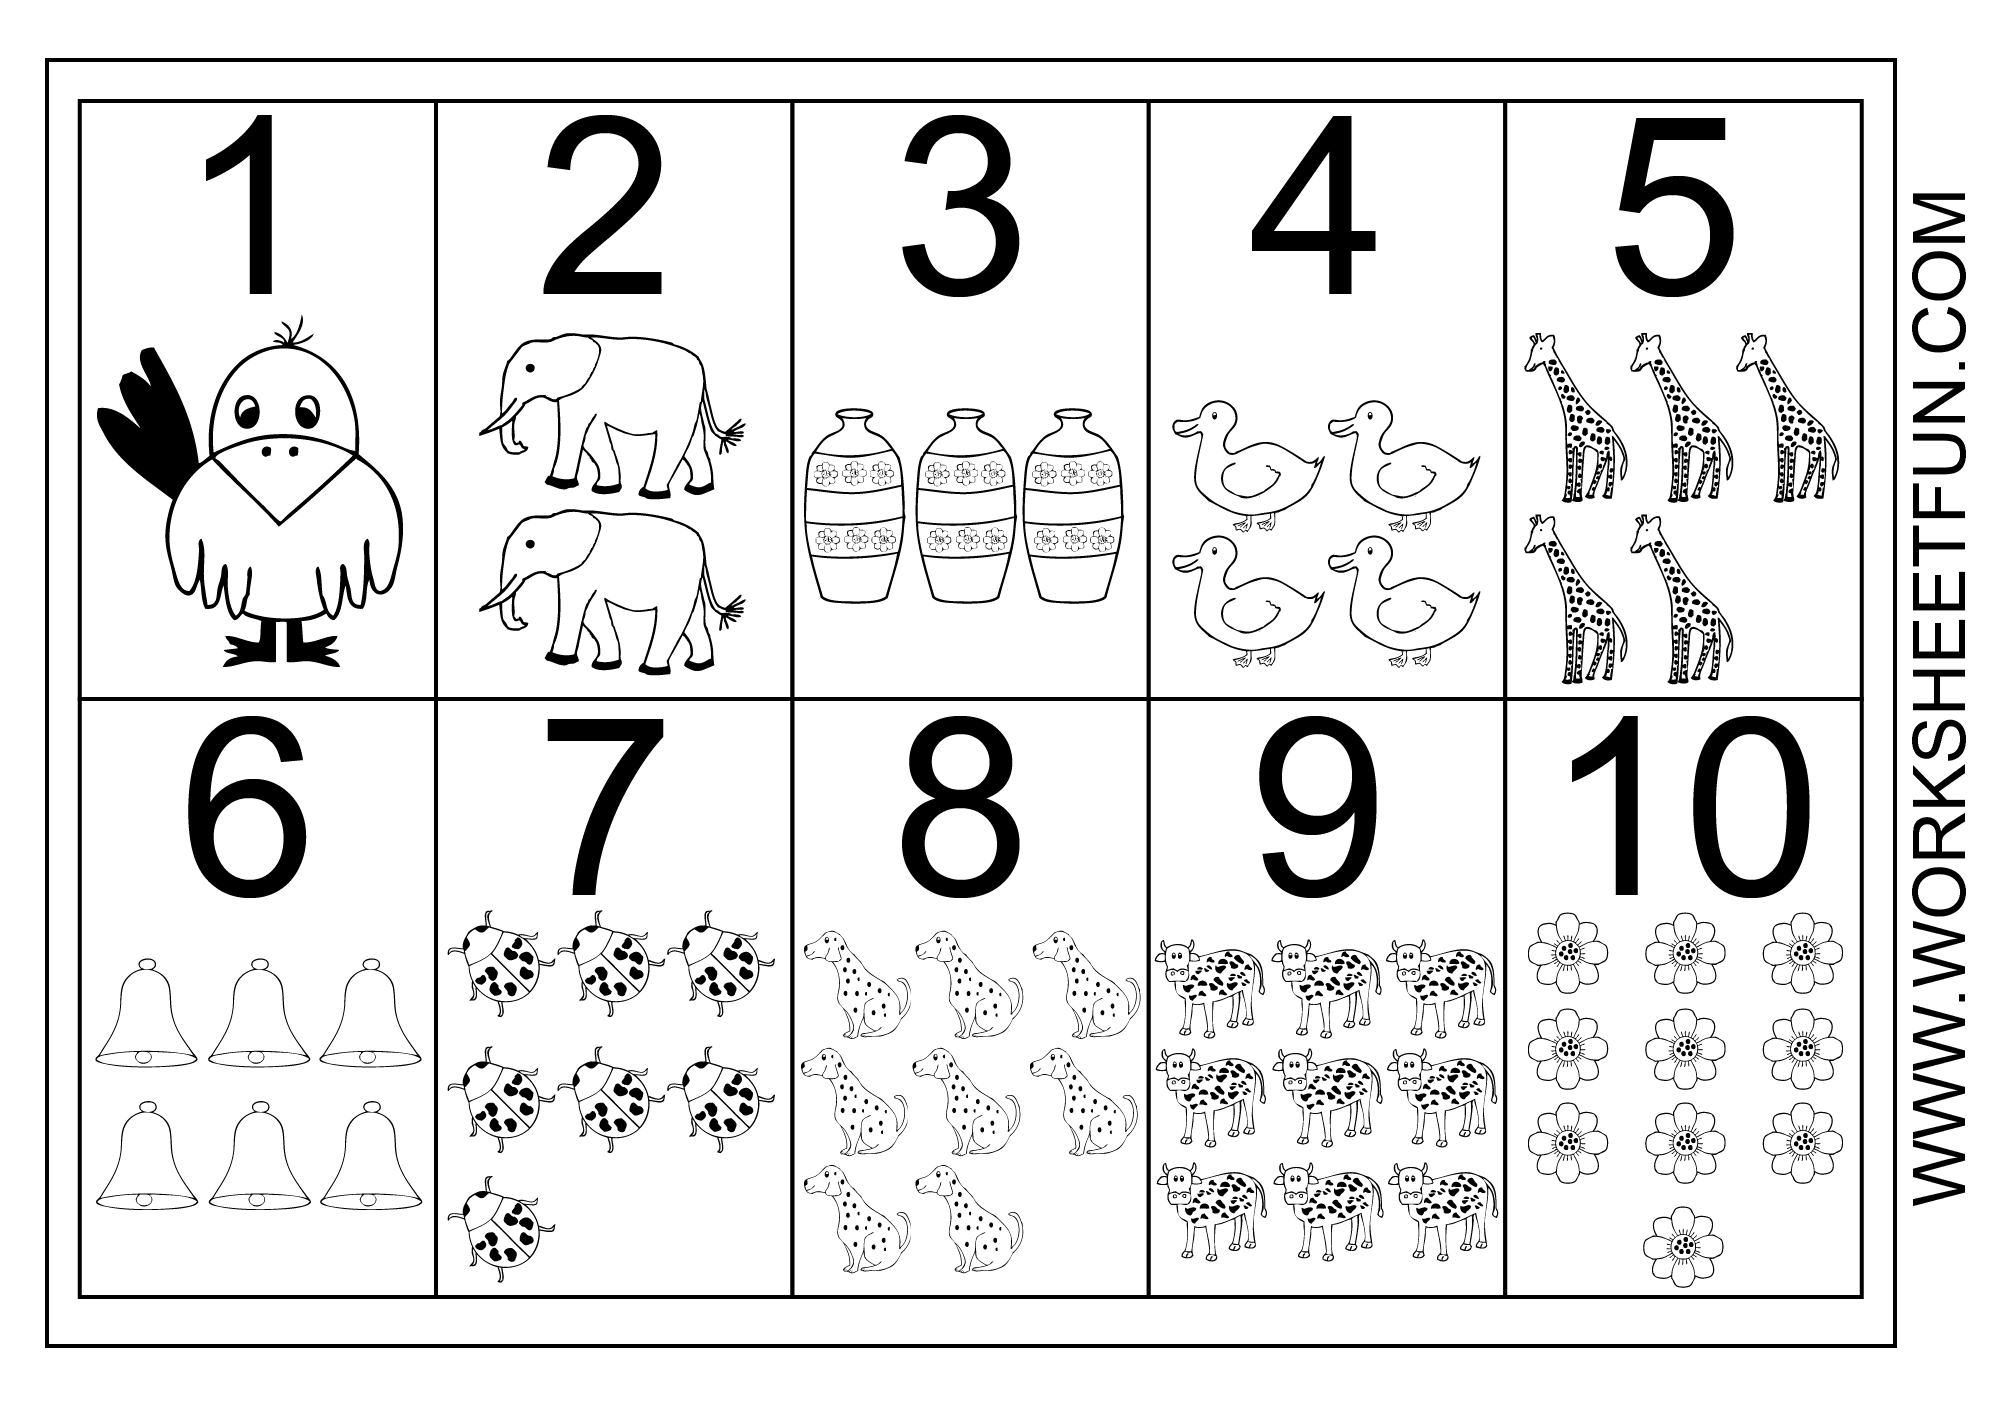 math worksheet : 7 best images of free printable worksheets numbers 1 10  : Kindergarten Number Tracing Worksheets